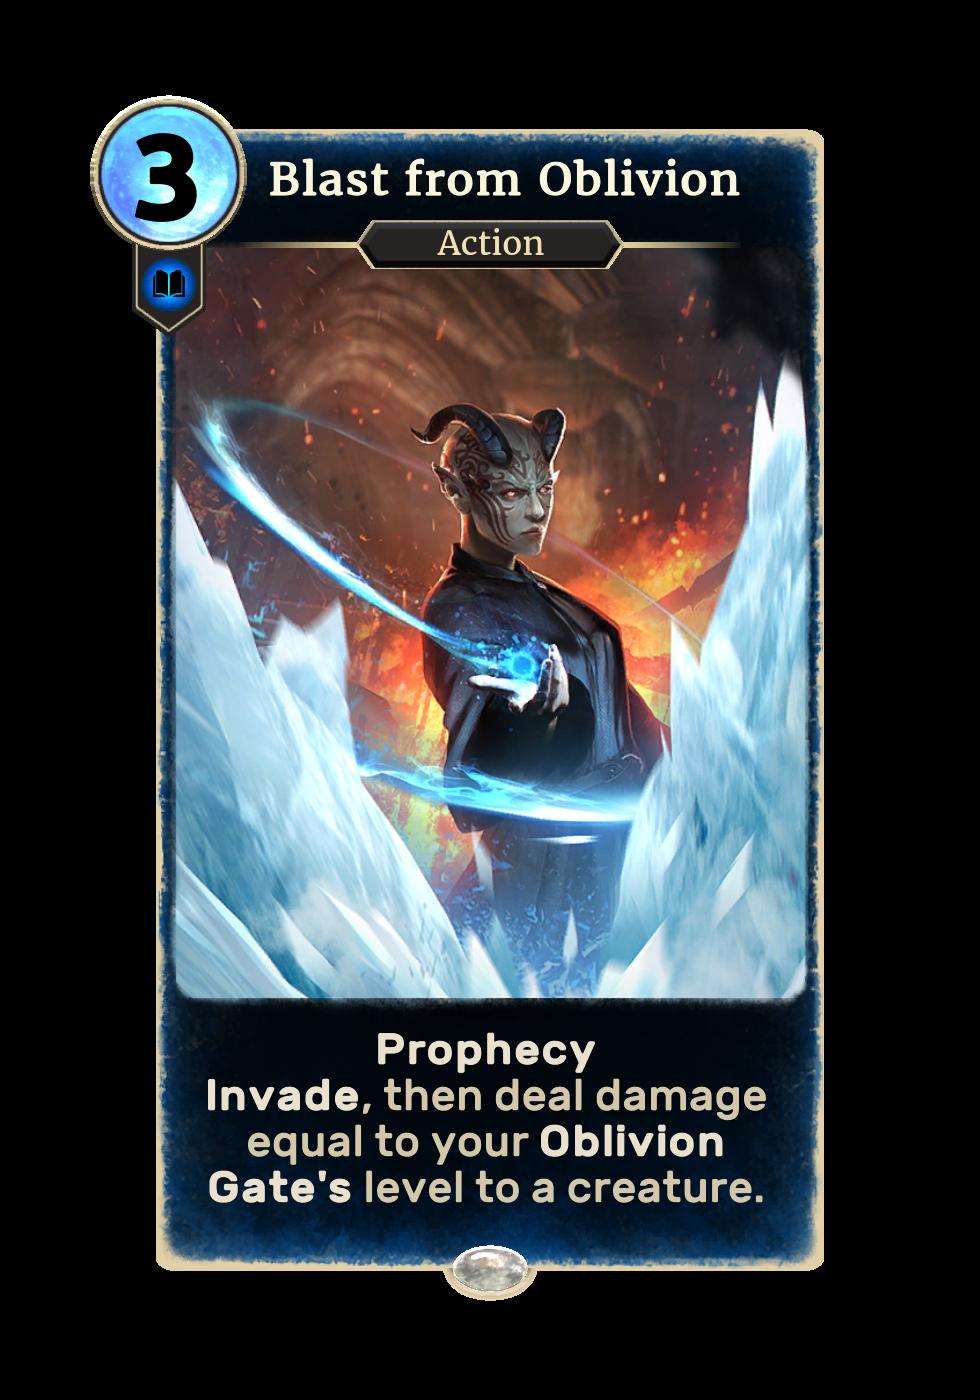 Blast from Oblivion